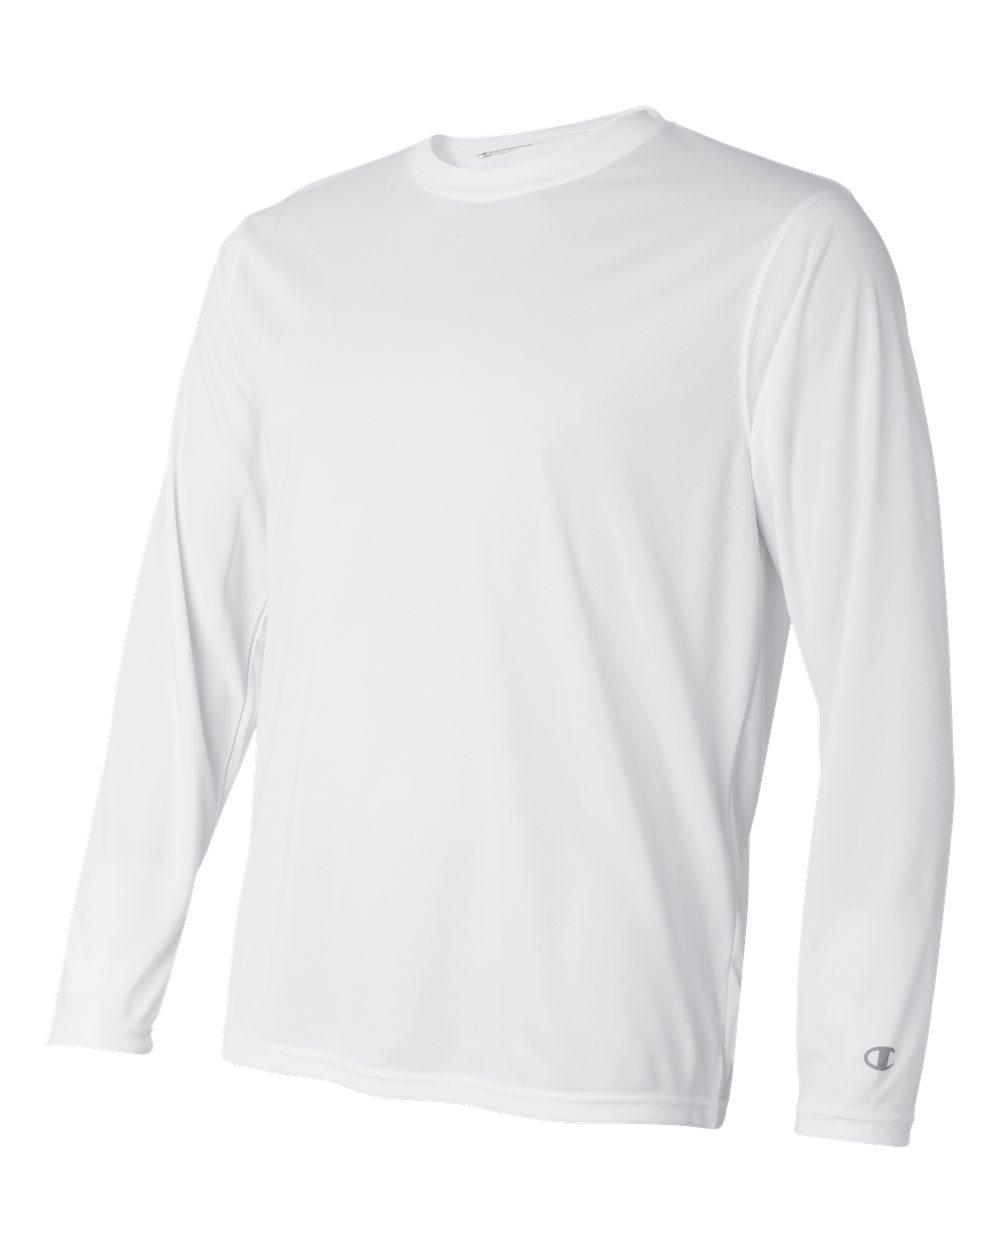 Champion-Men-039-s-Double-Dry-4-1-oz-Long-Sleeve-Interlock-T-Shirt-CW26-XS-3XL thumbnail 33